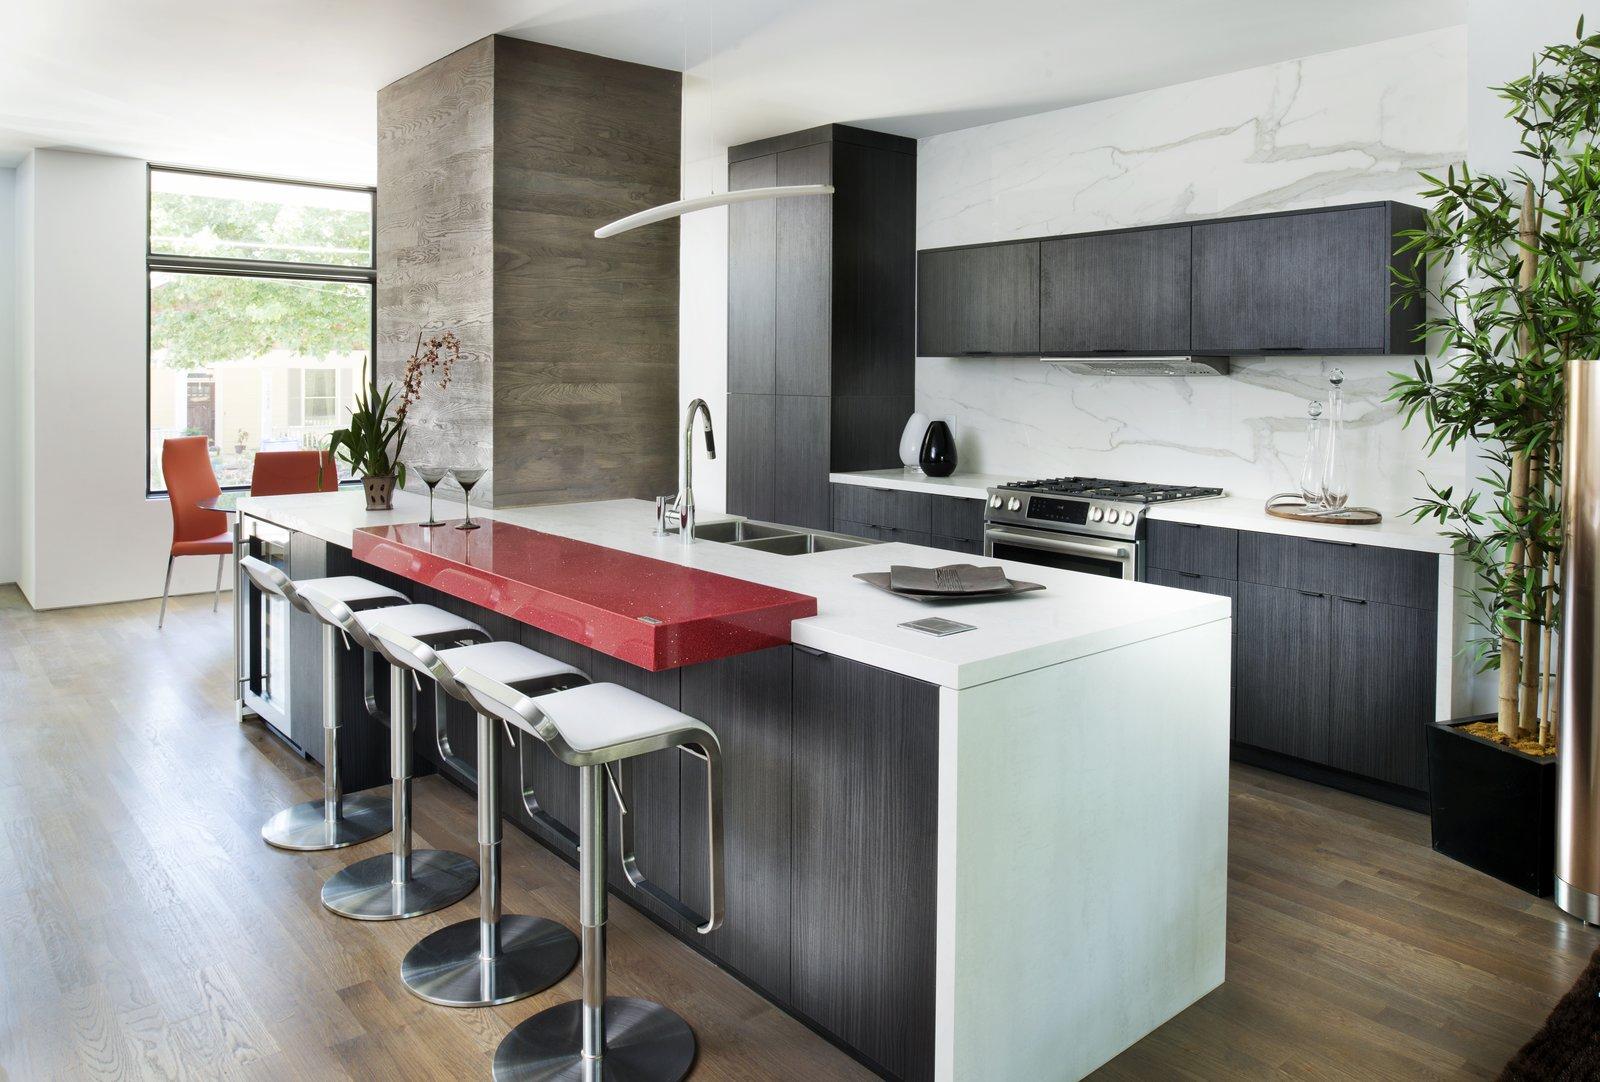 Kitchen, Quartzite Counter, Engineered Quartz Counter, Laminate Cabinet, Medium Hardwood Floor, Stone Slab Backsplashe, Pendant Lighting, Range, Range Hood, and Undermount Sink Kitchen Island  Photos from Sanders